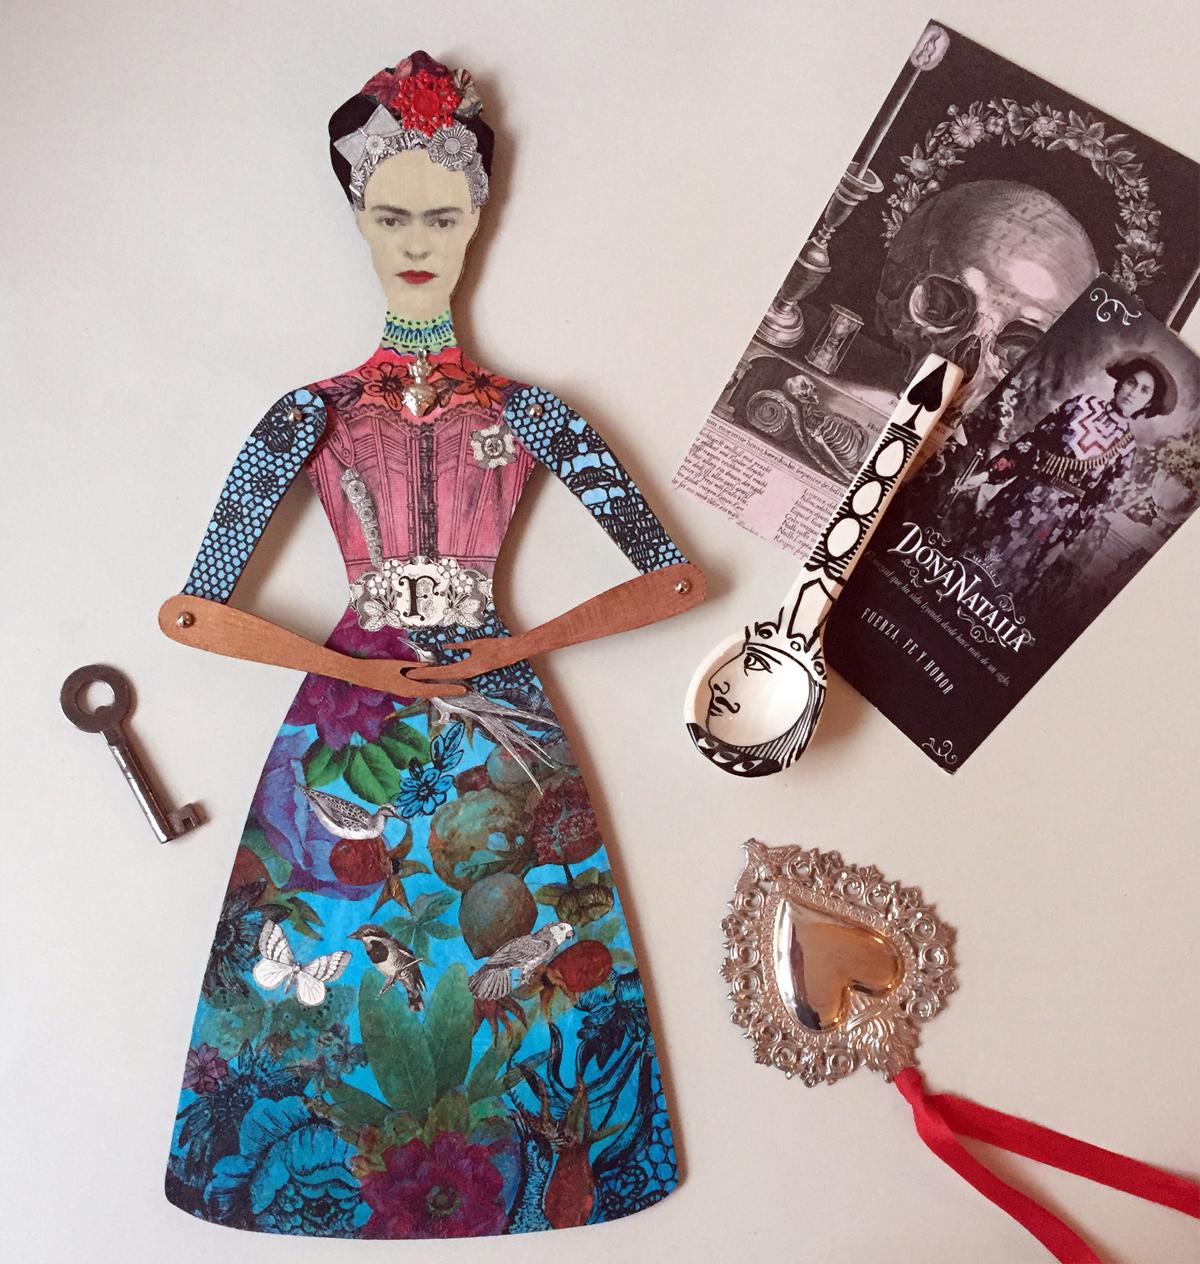 Frida Kahlo doll by Gabriela Szulman at 49 Peckarmans Wood, Dulwich Open House 2018